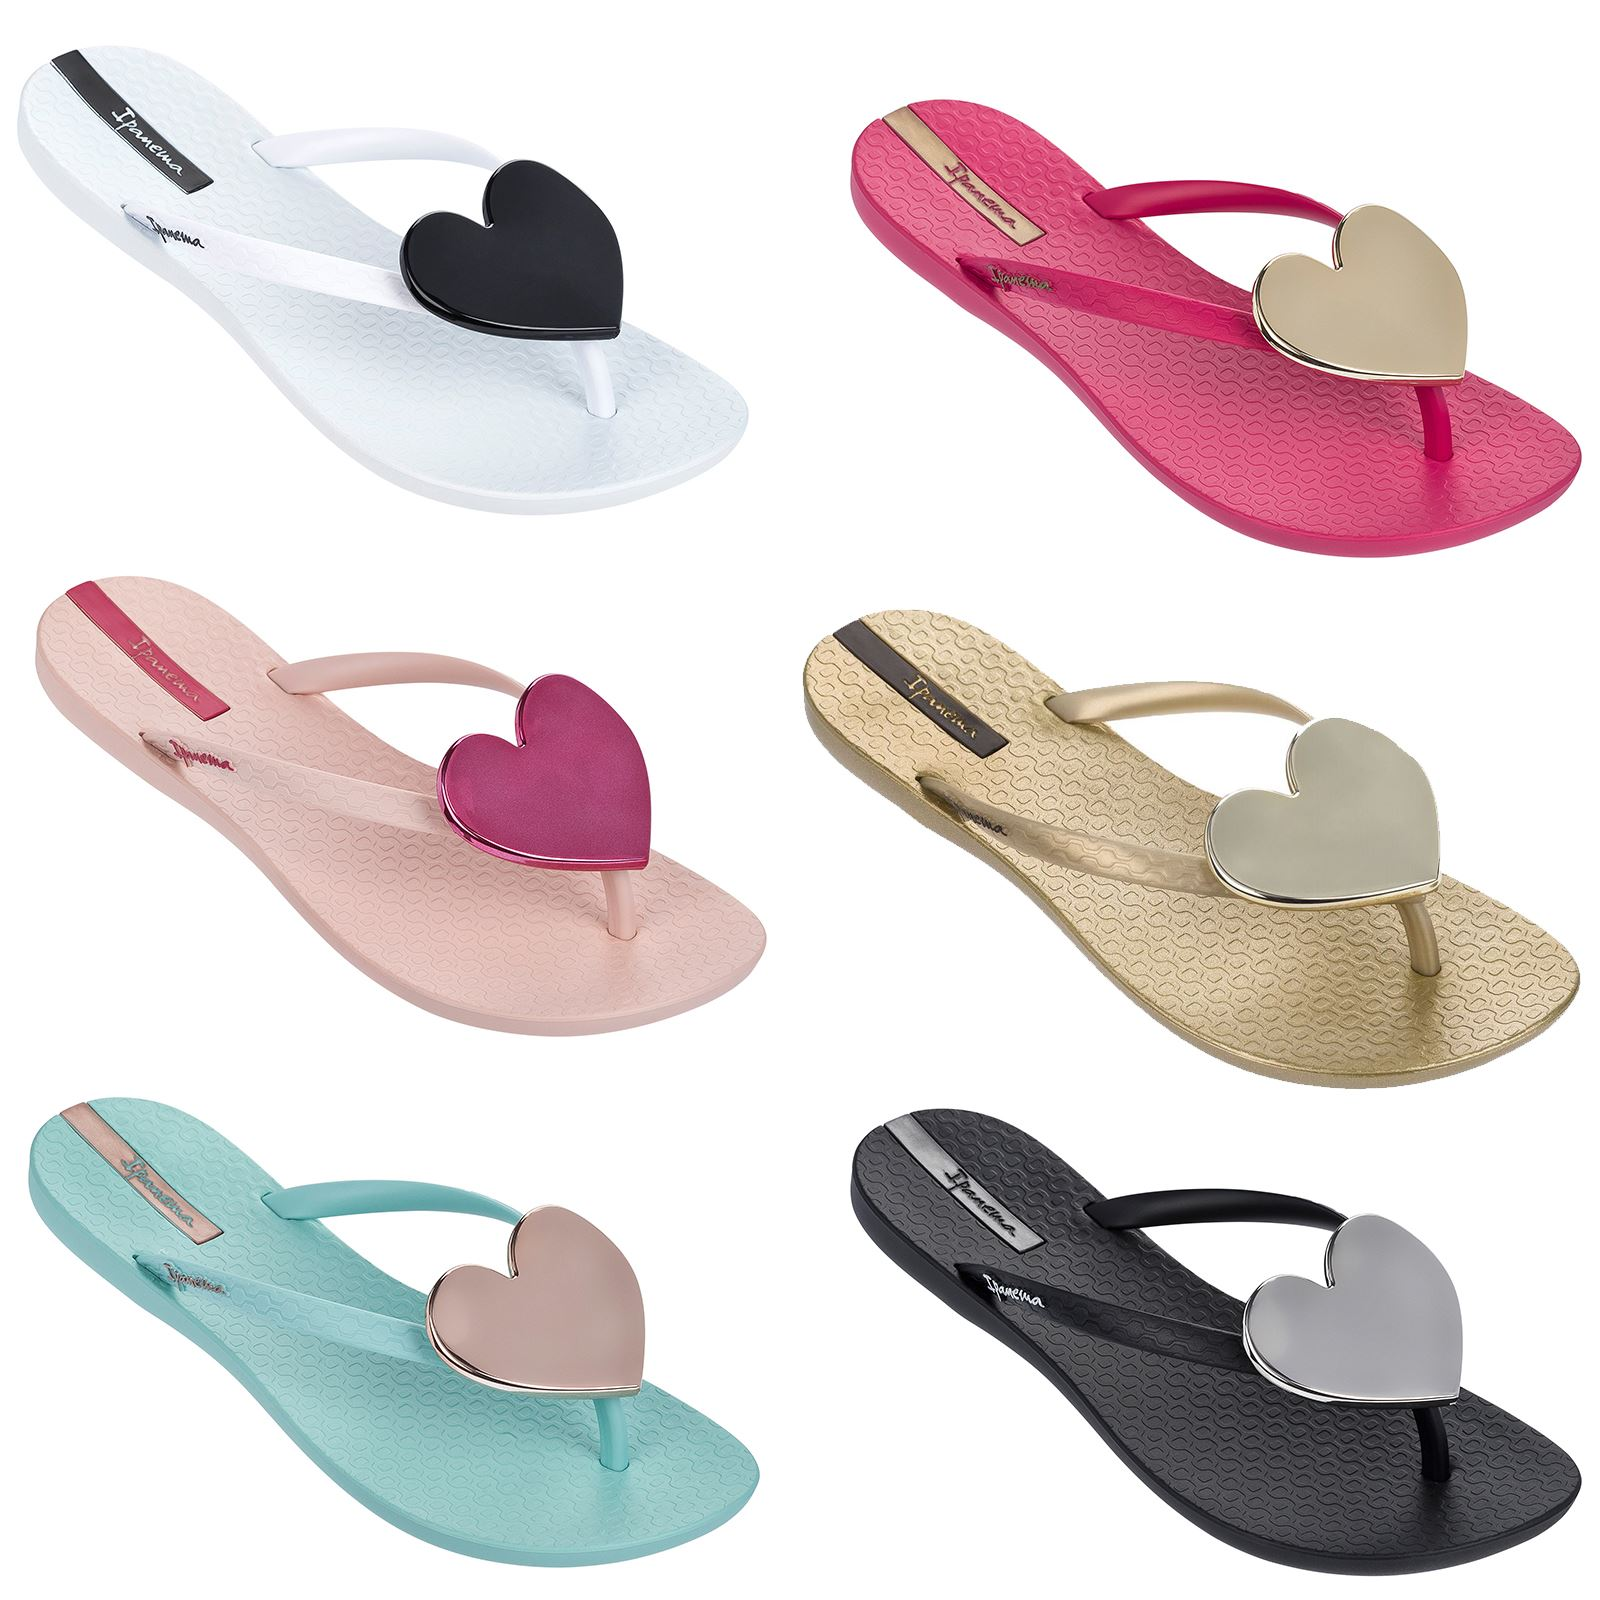 3e7631c9674b Details about Ipanema Wave Maxi Heart Flip Flops Slim Footbed Beach Sandals  82120